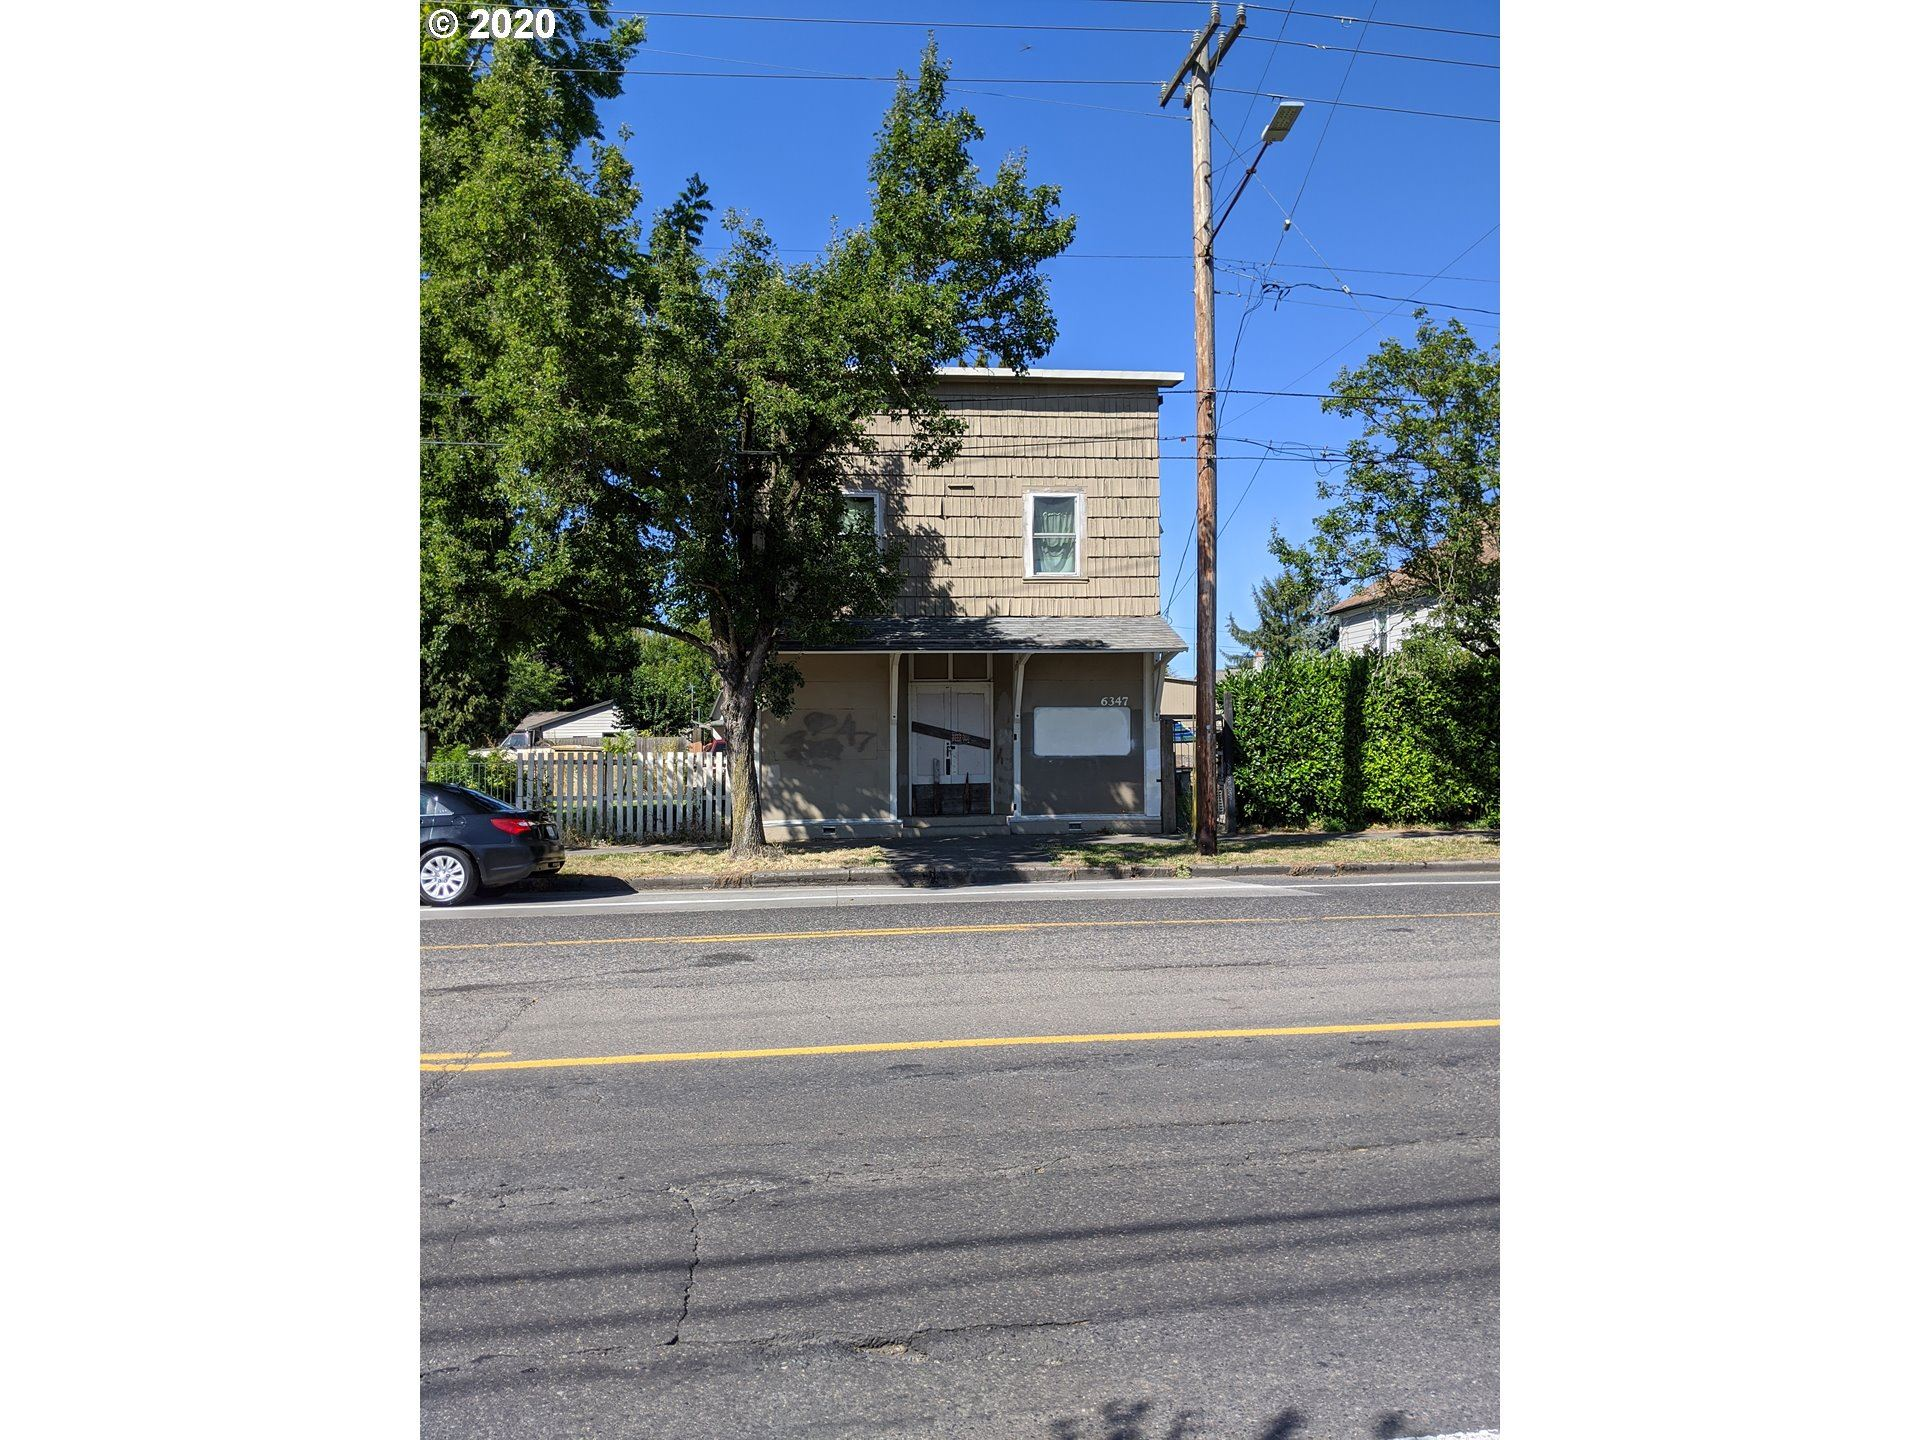 6343 N LOMBARD ST, Portland, OR 97203 - MLS#: 20007890